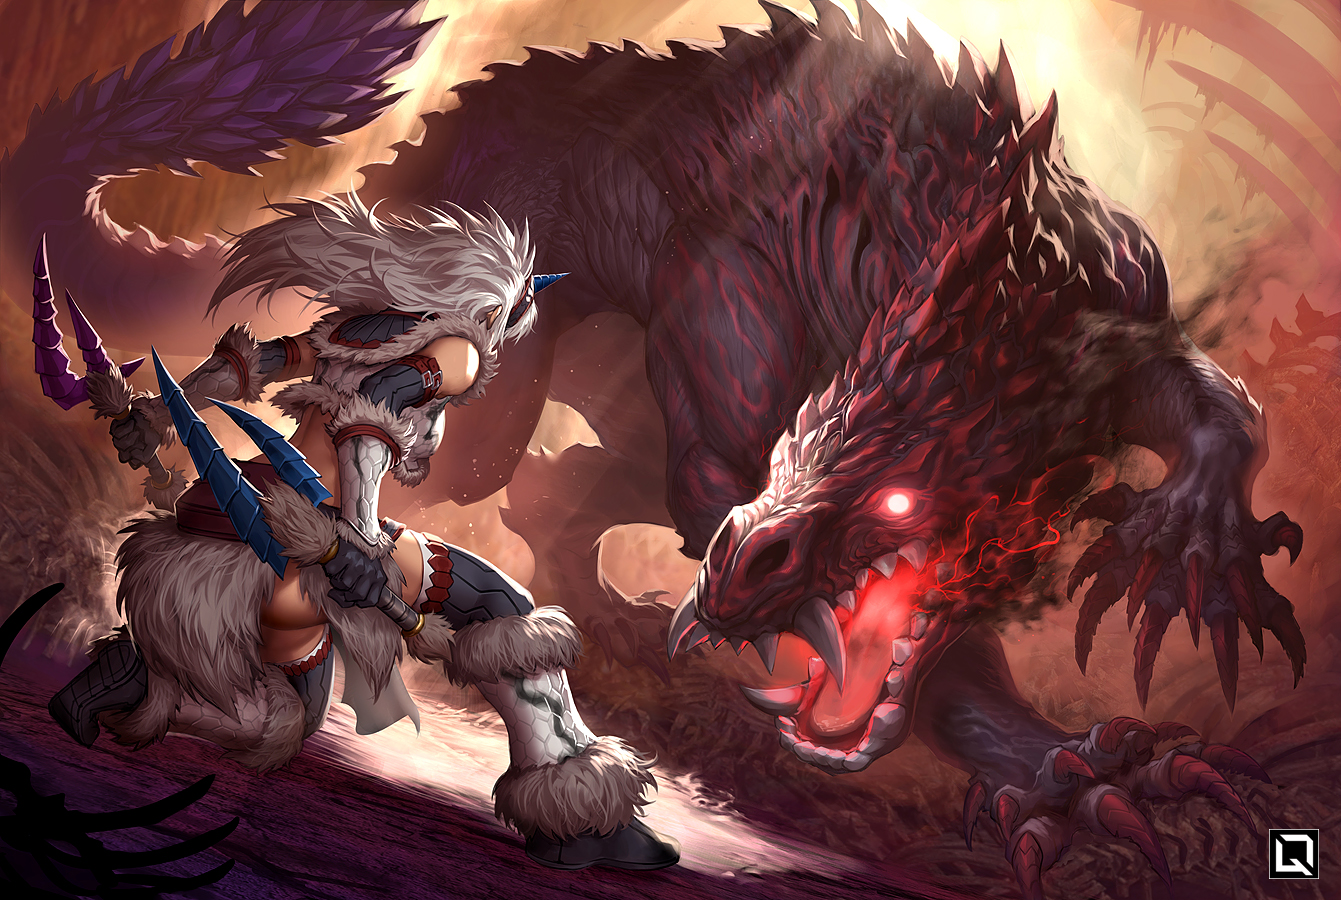 boots gloves gray_hair headband horns kirin_(armor) kuroi-tsuki long_hair monster_hunter monster_hunter:_world odogaron watermark weapon